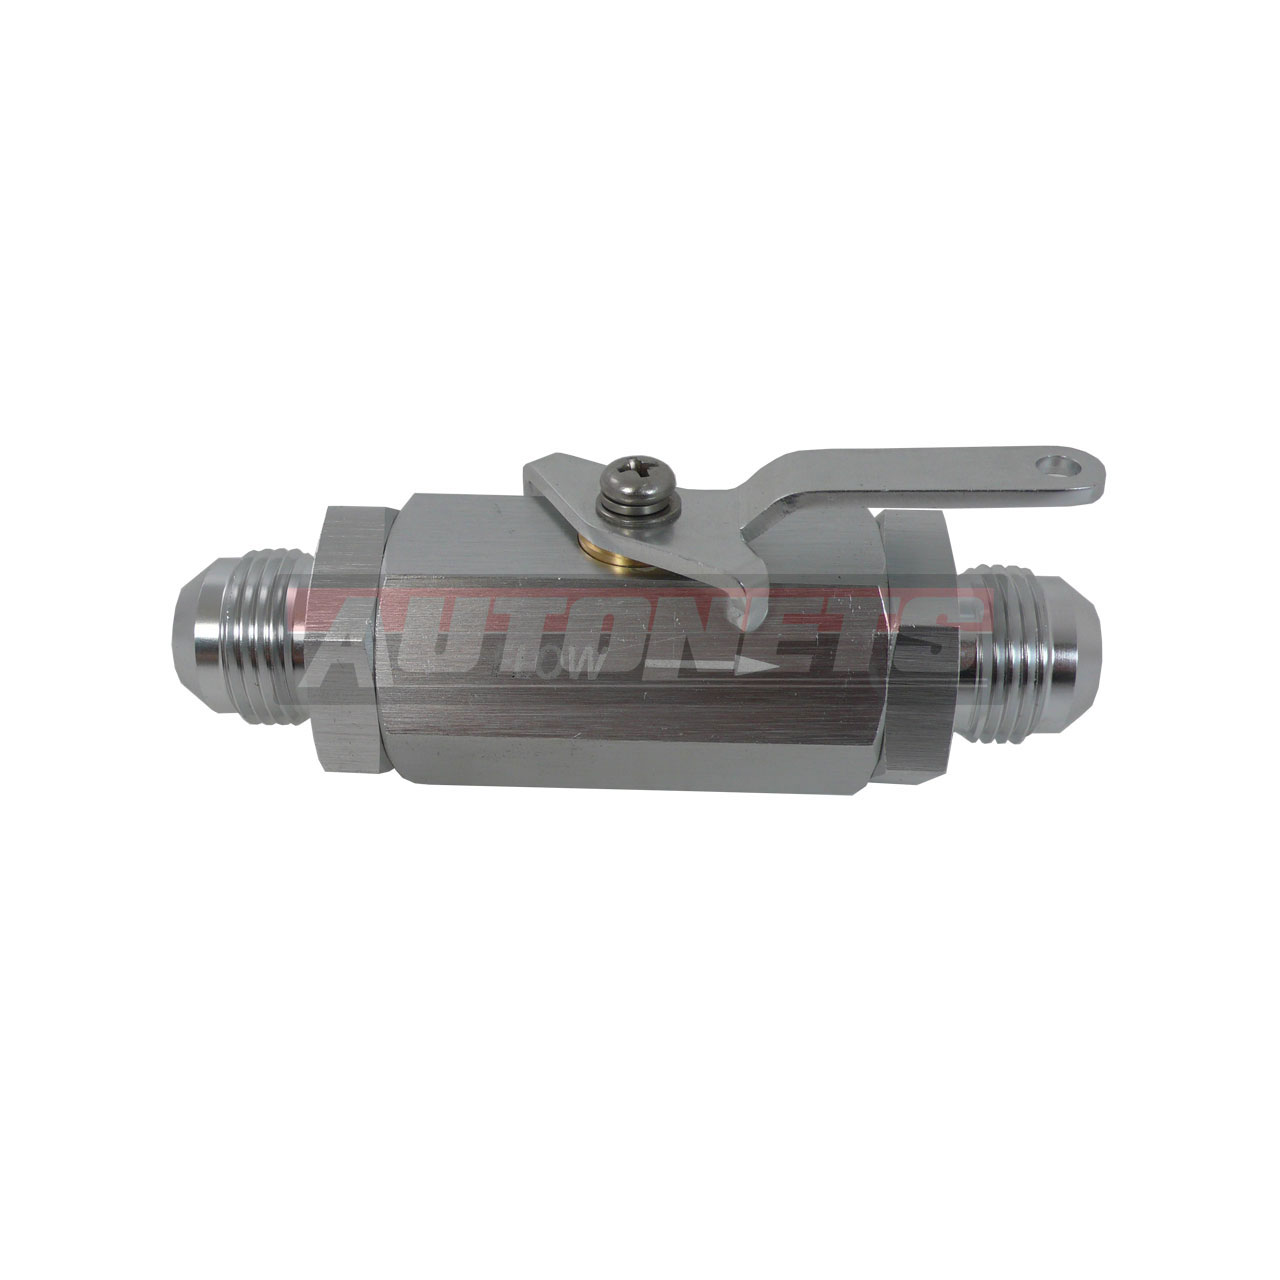 Shut Off Cable : An aluminum inline fuel shut off valve cut w